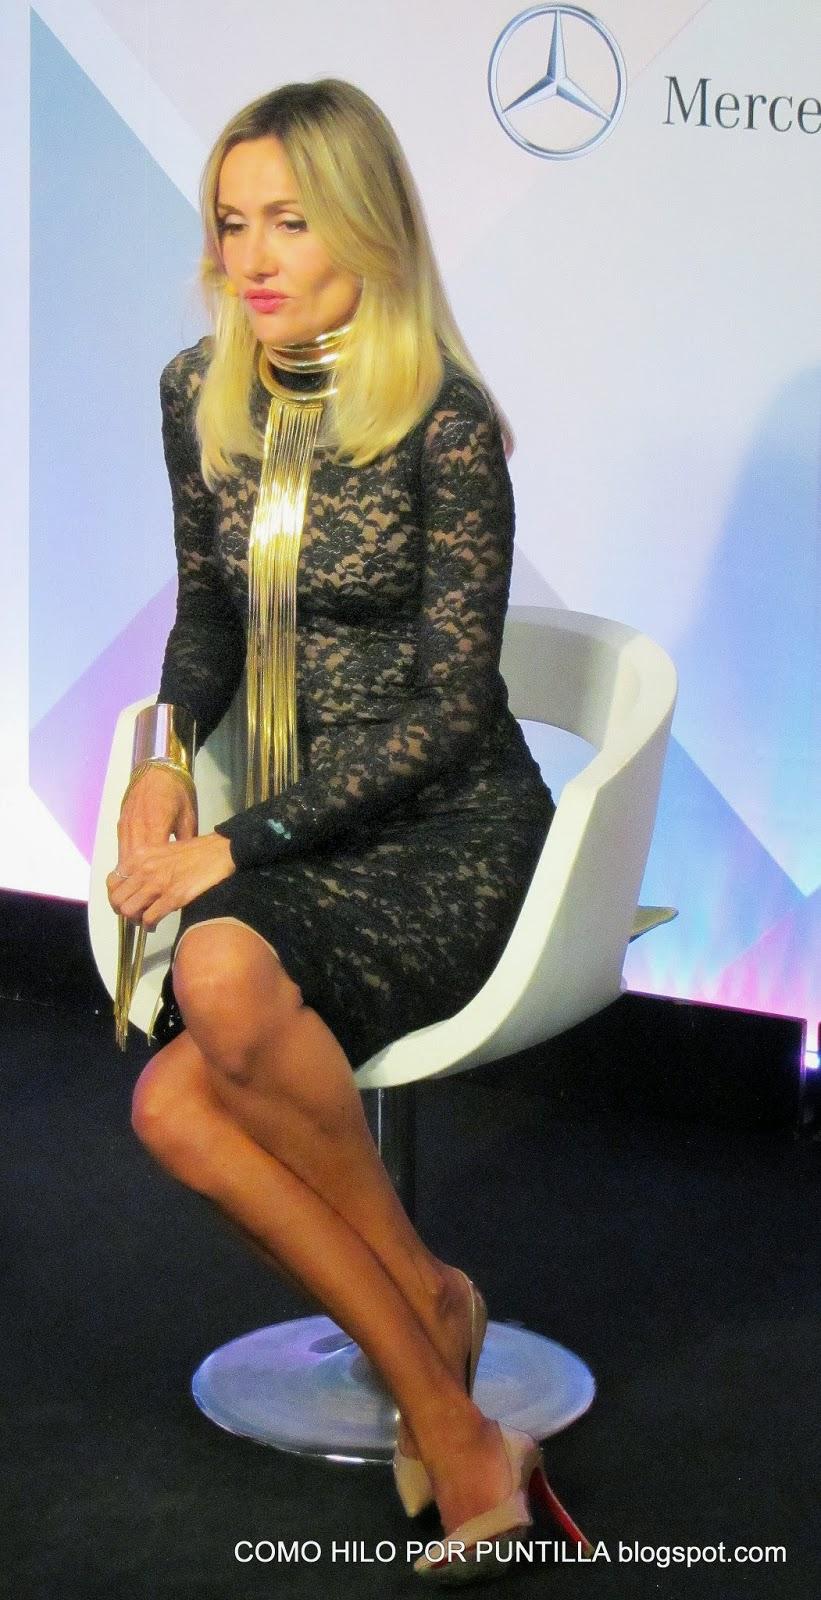 Clara-Courel